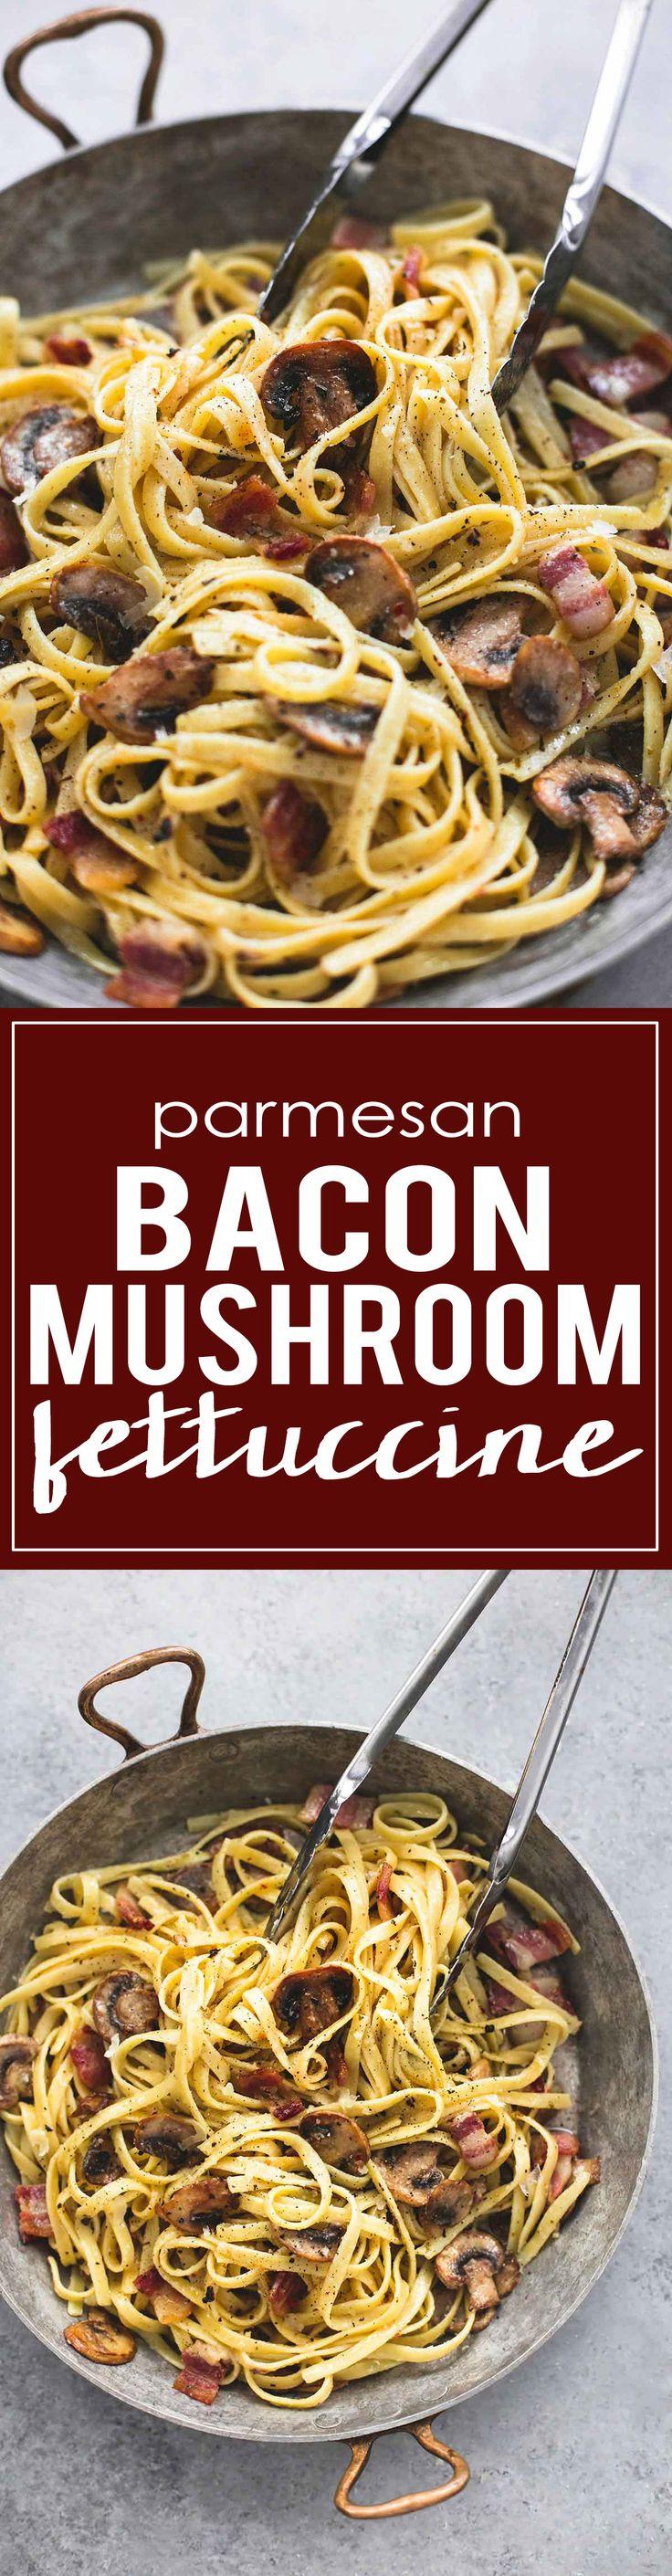 One Pan Parmesan Bacon Mushroom Fettuccine | lecremedelacrumb.com